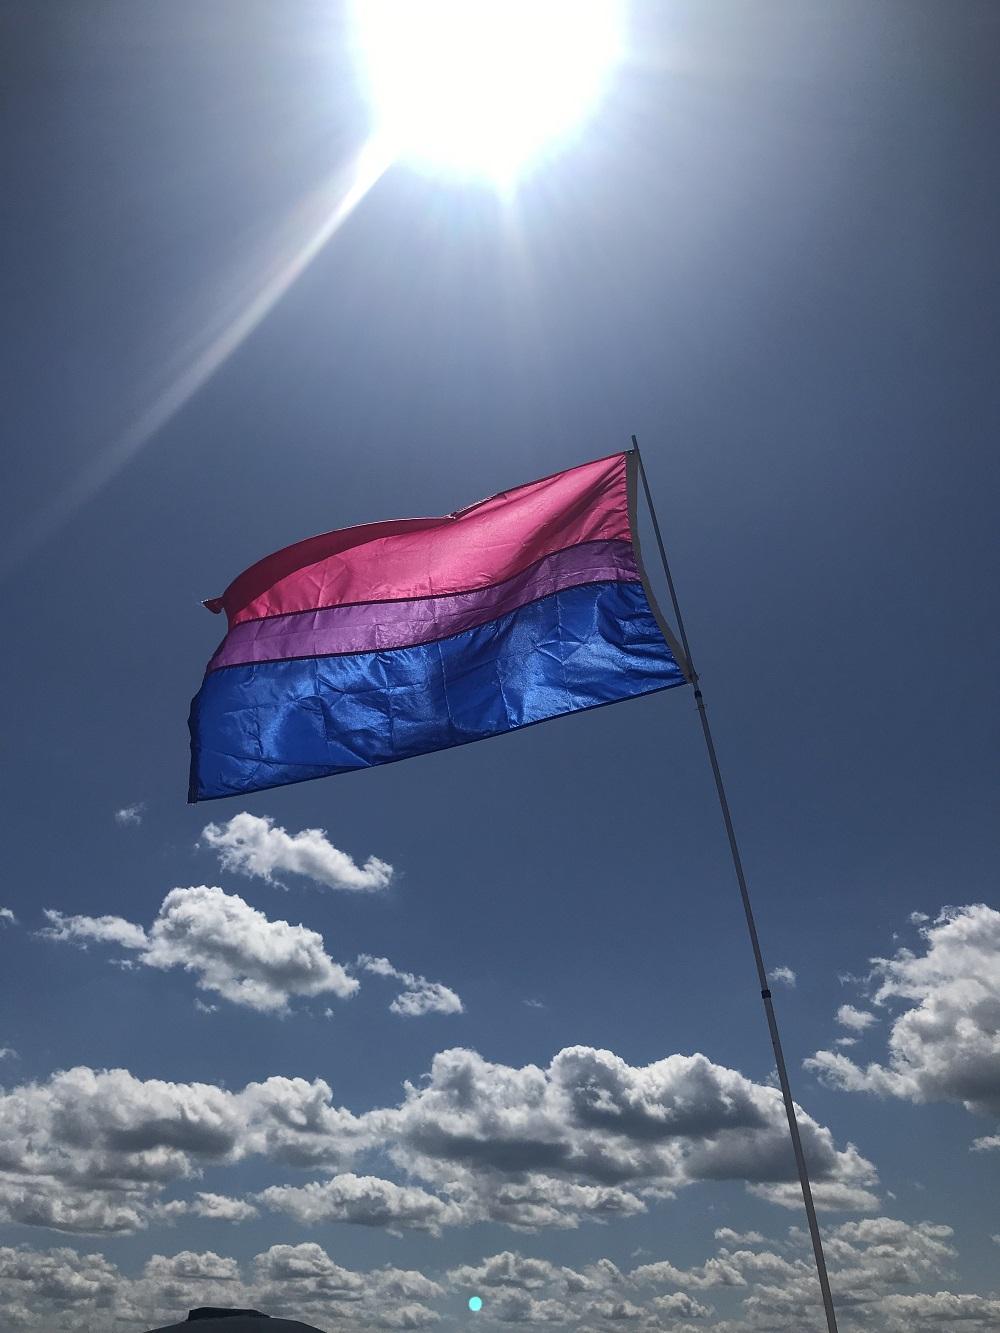 bi pride flag flying at Gunnison beach, August 2019. Photo by Robin Renée